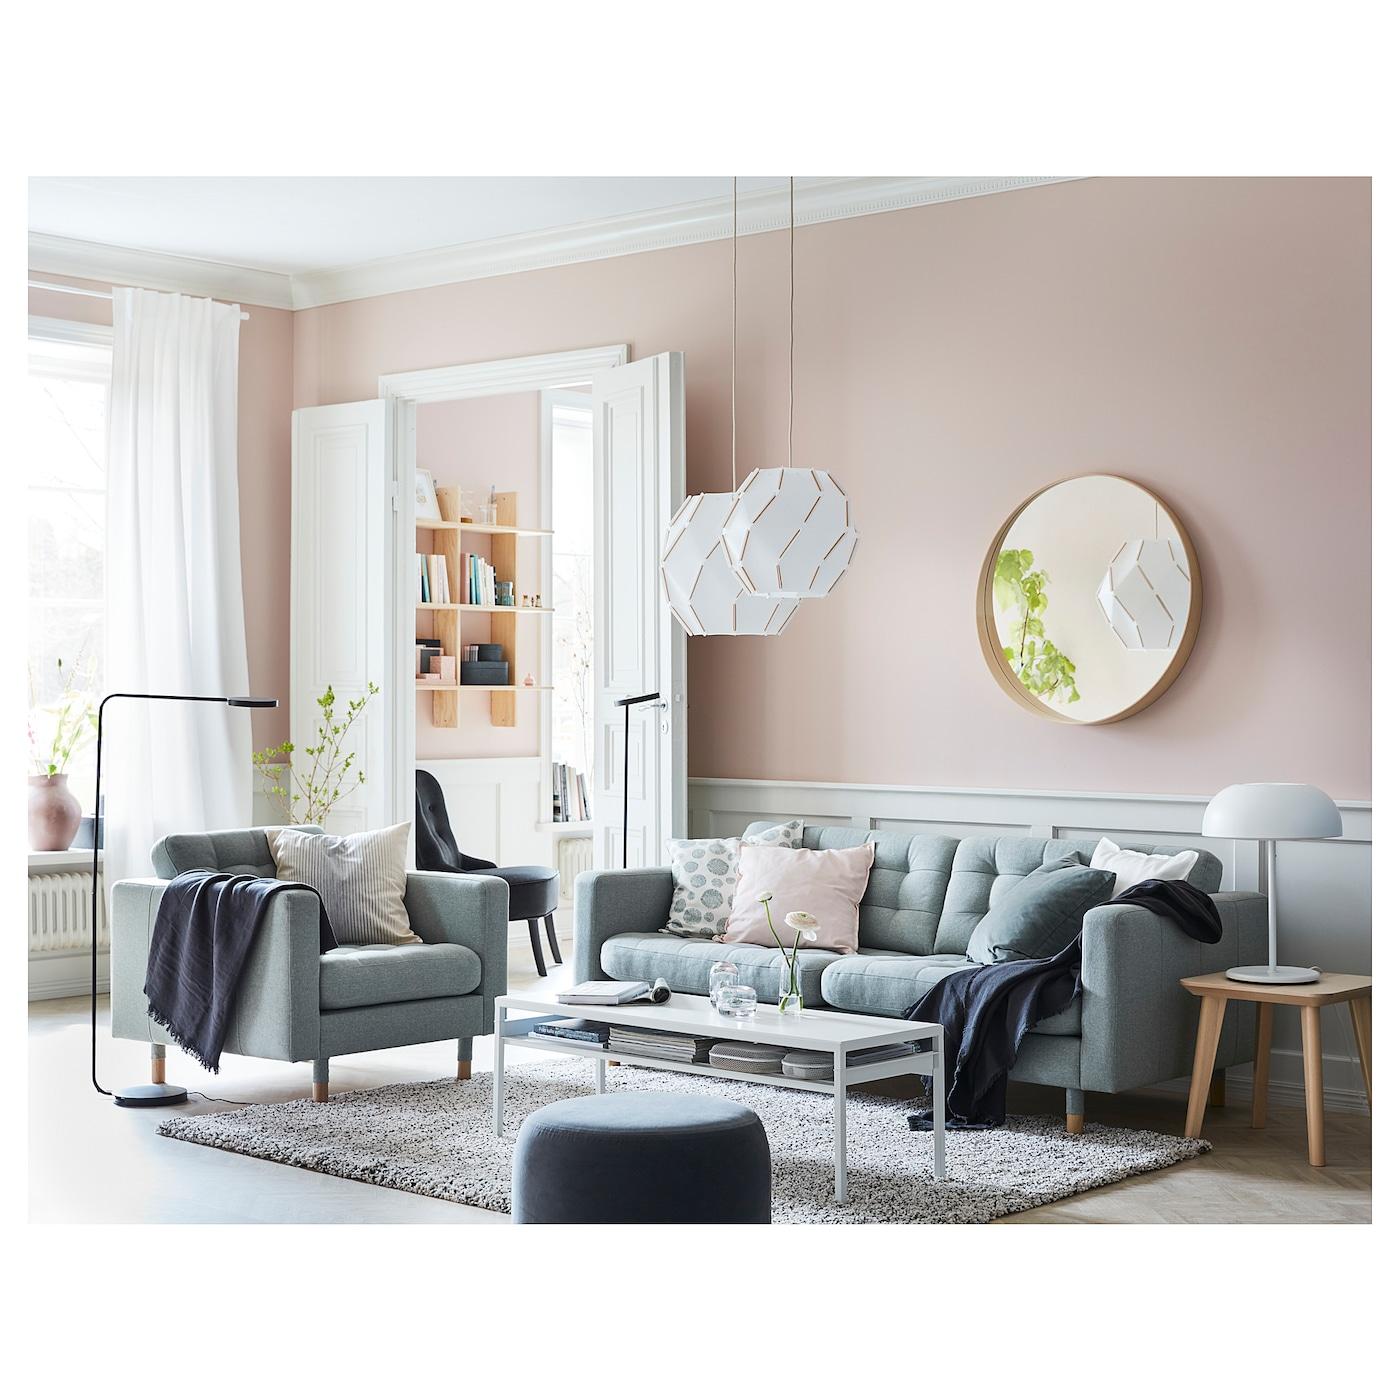 LANDSKRONA 8-seat sofa - Gunnared light green/wood